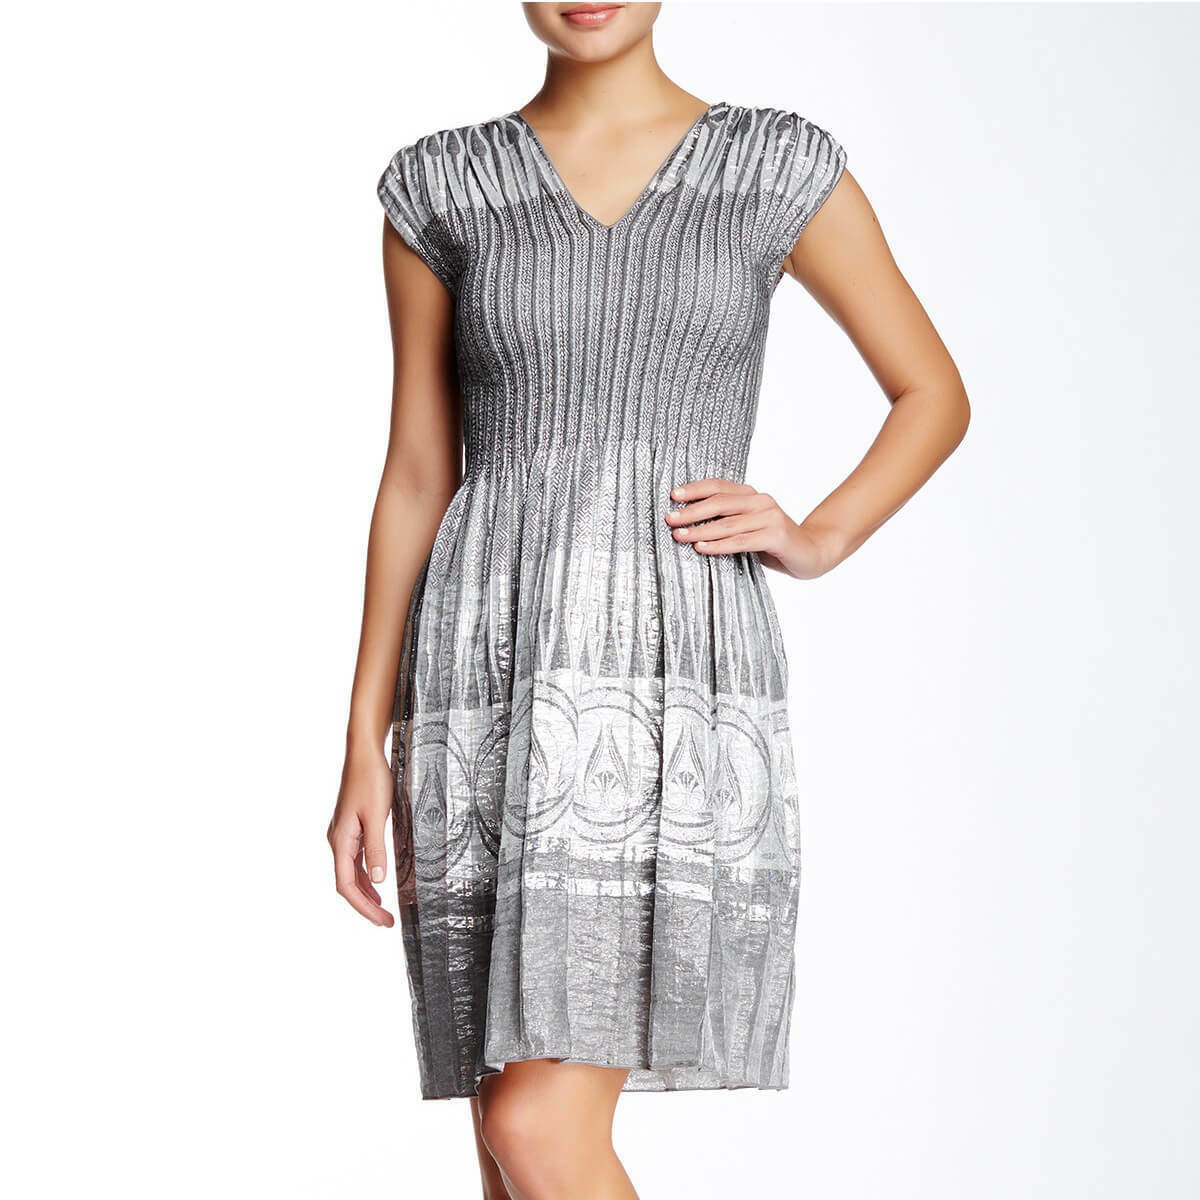 Metallic Jacquard  Dress NWT - SZ-6